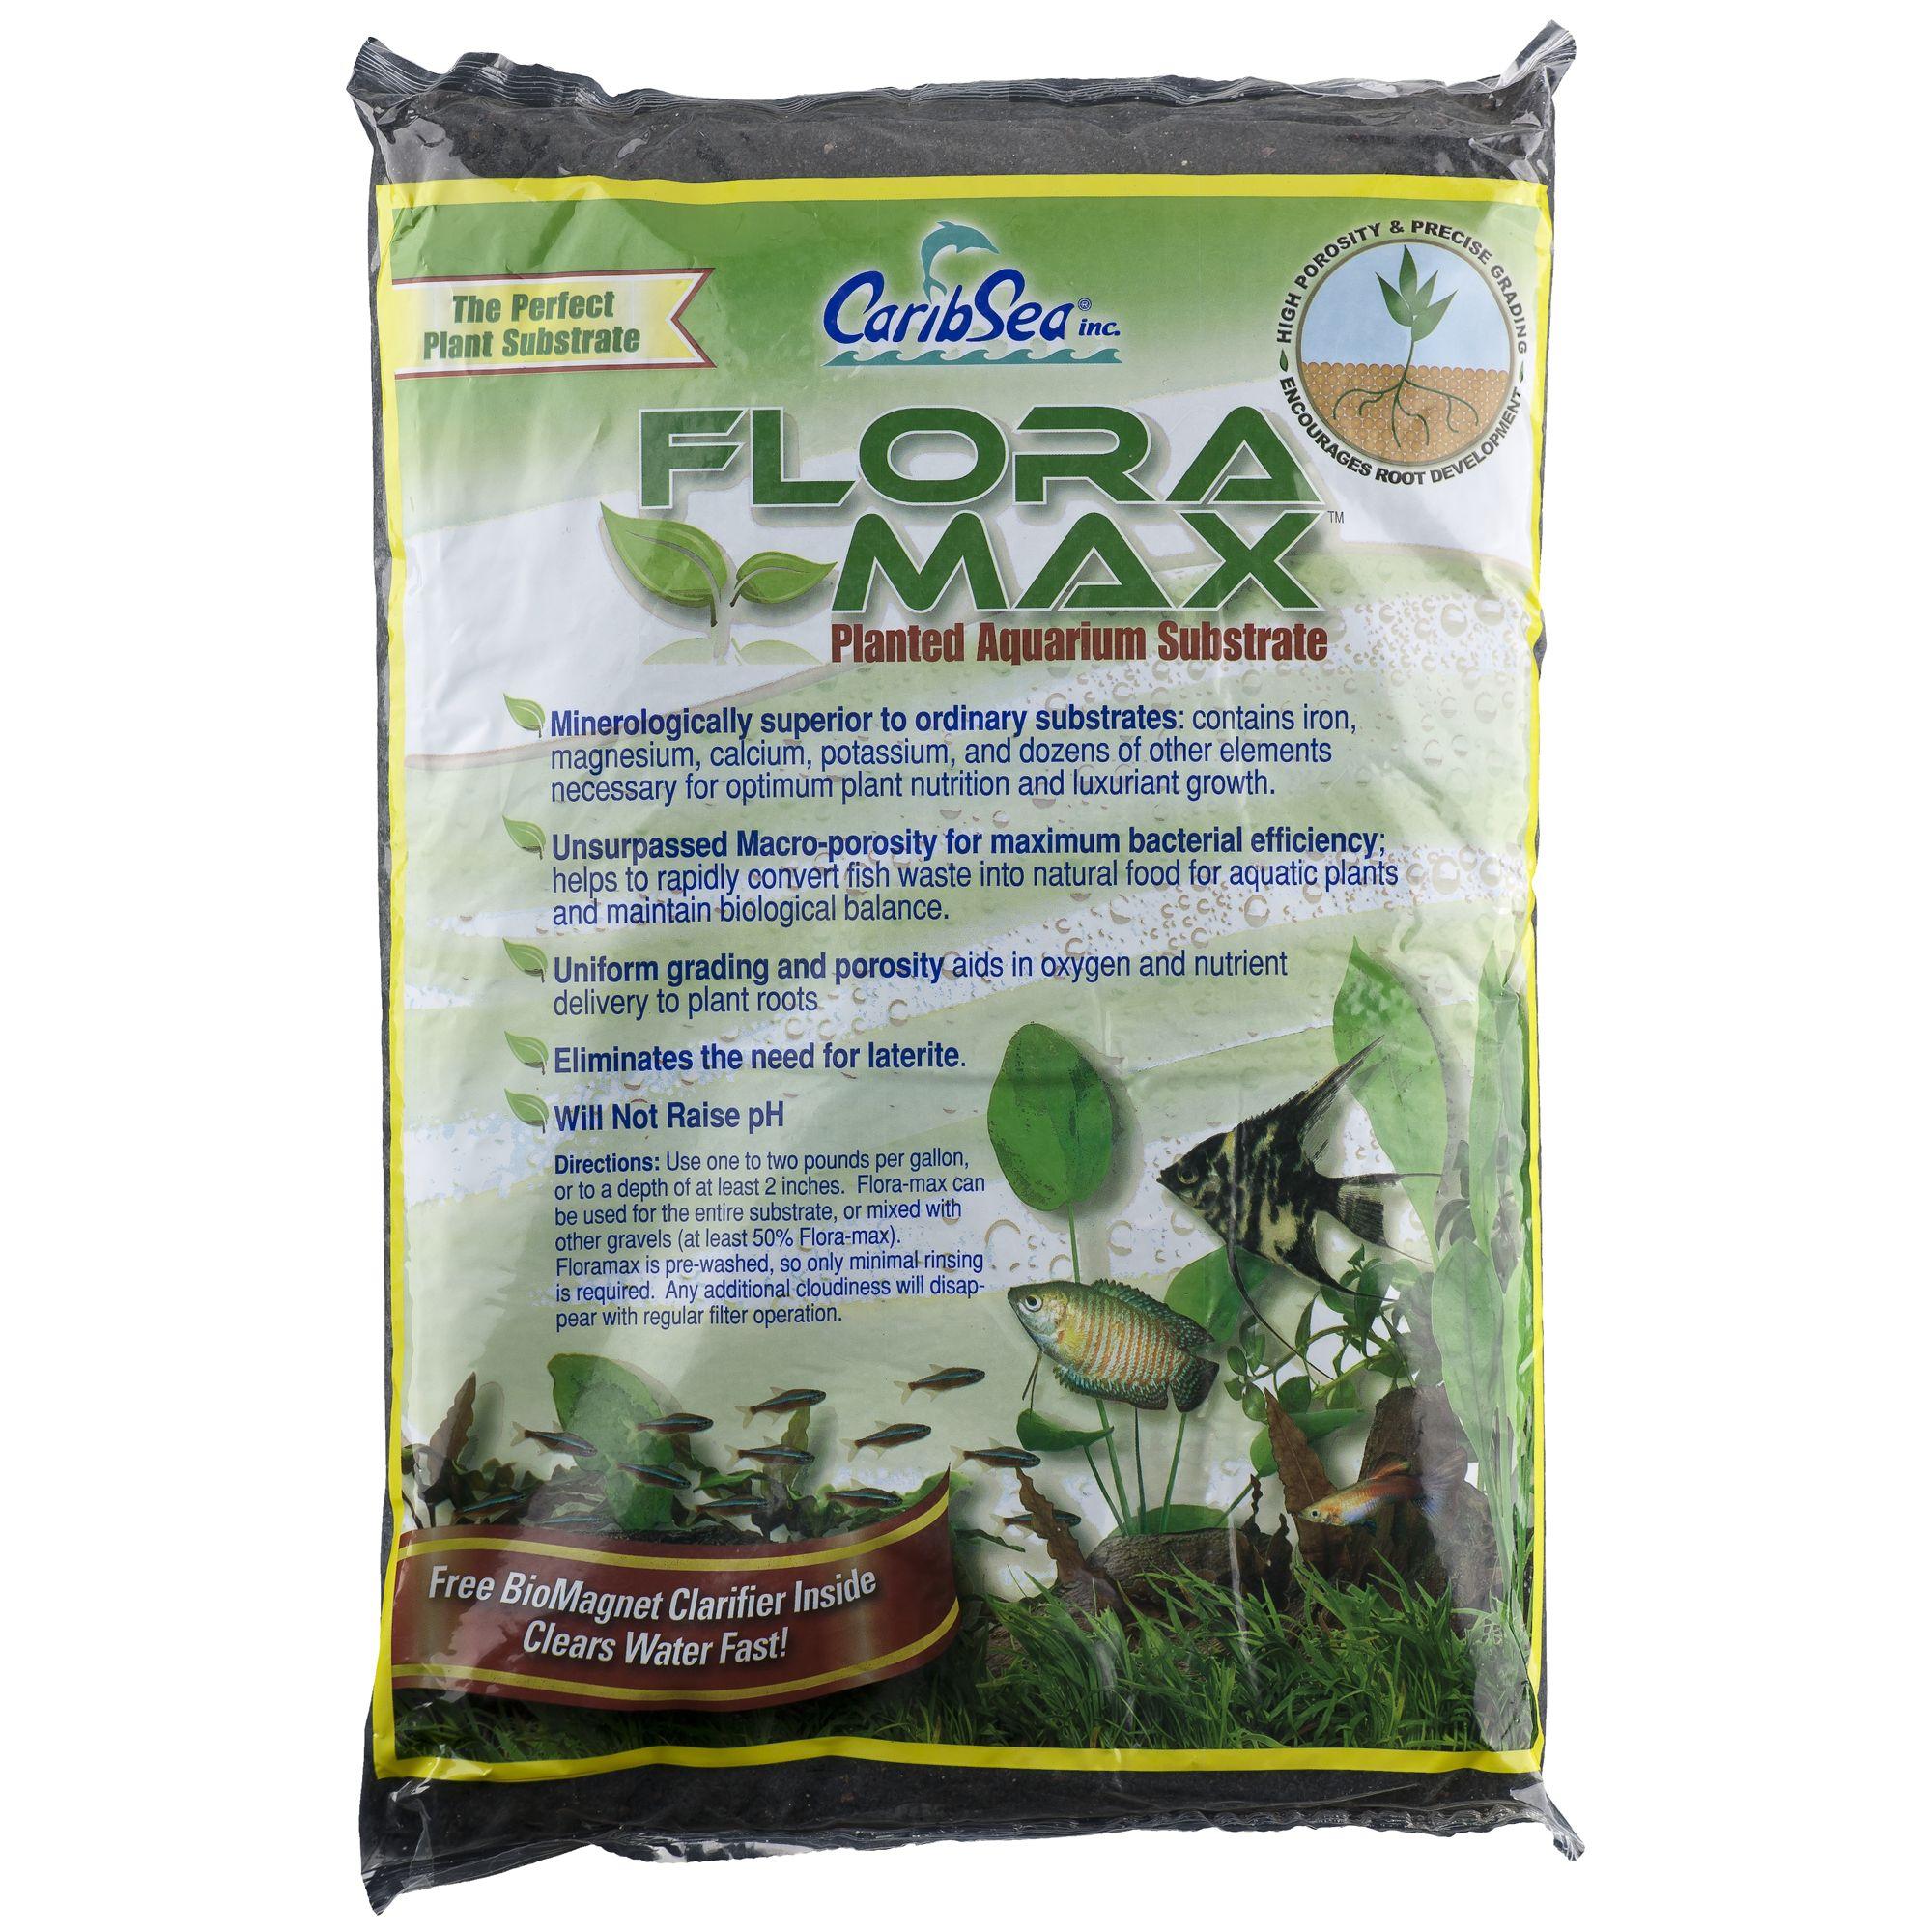 Caribsea Flora Max Planted Aquarium Substrate Size 12 Lb Midnight Black